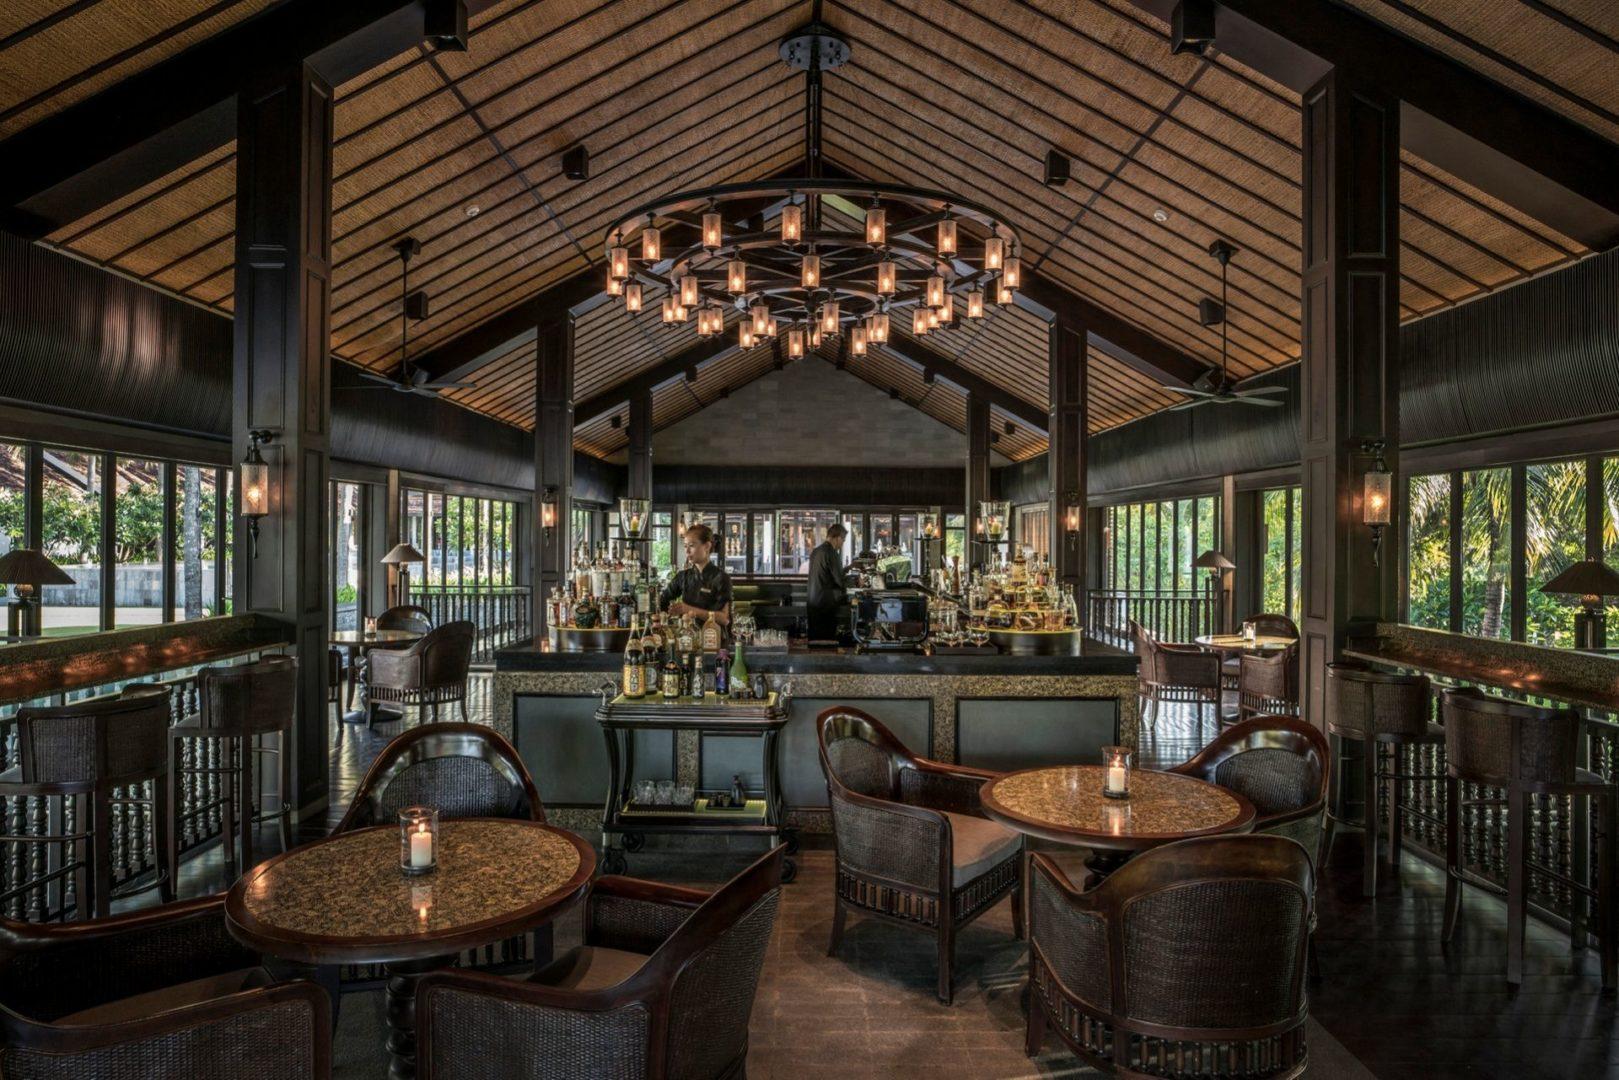 The inviting resort bar